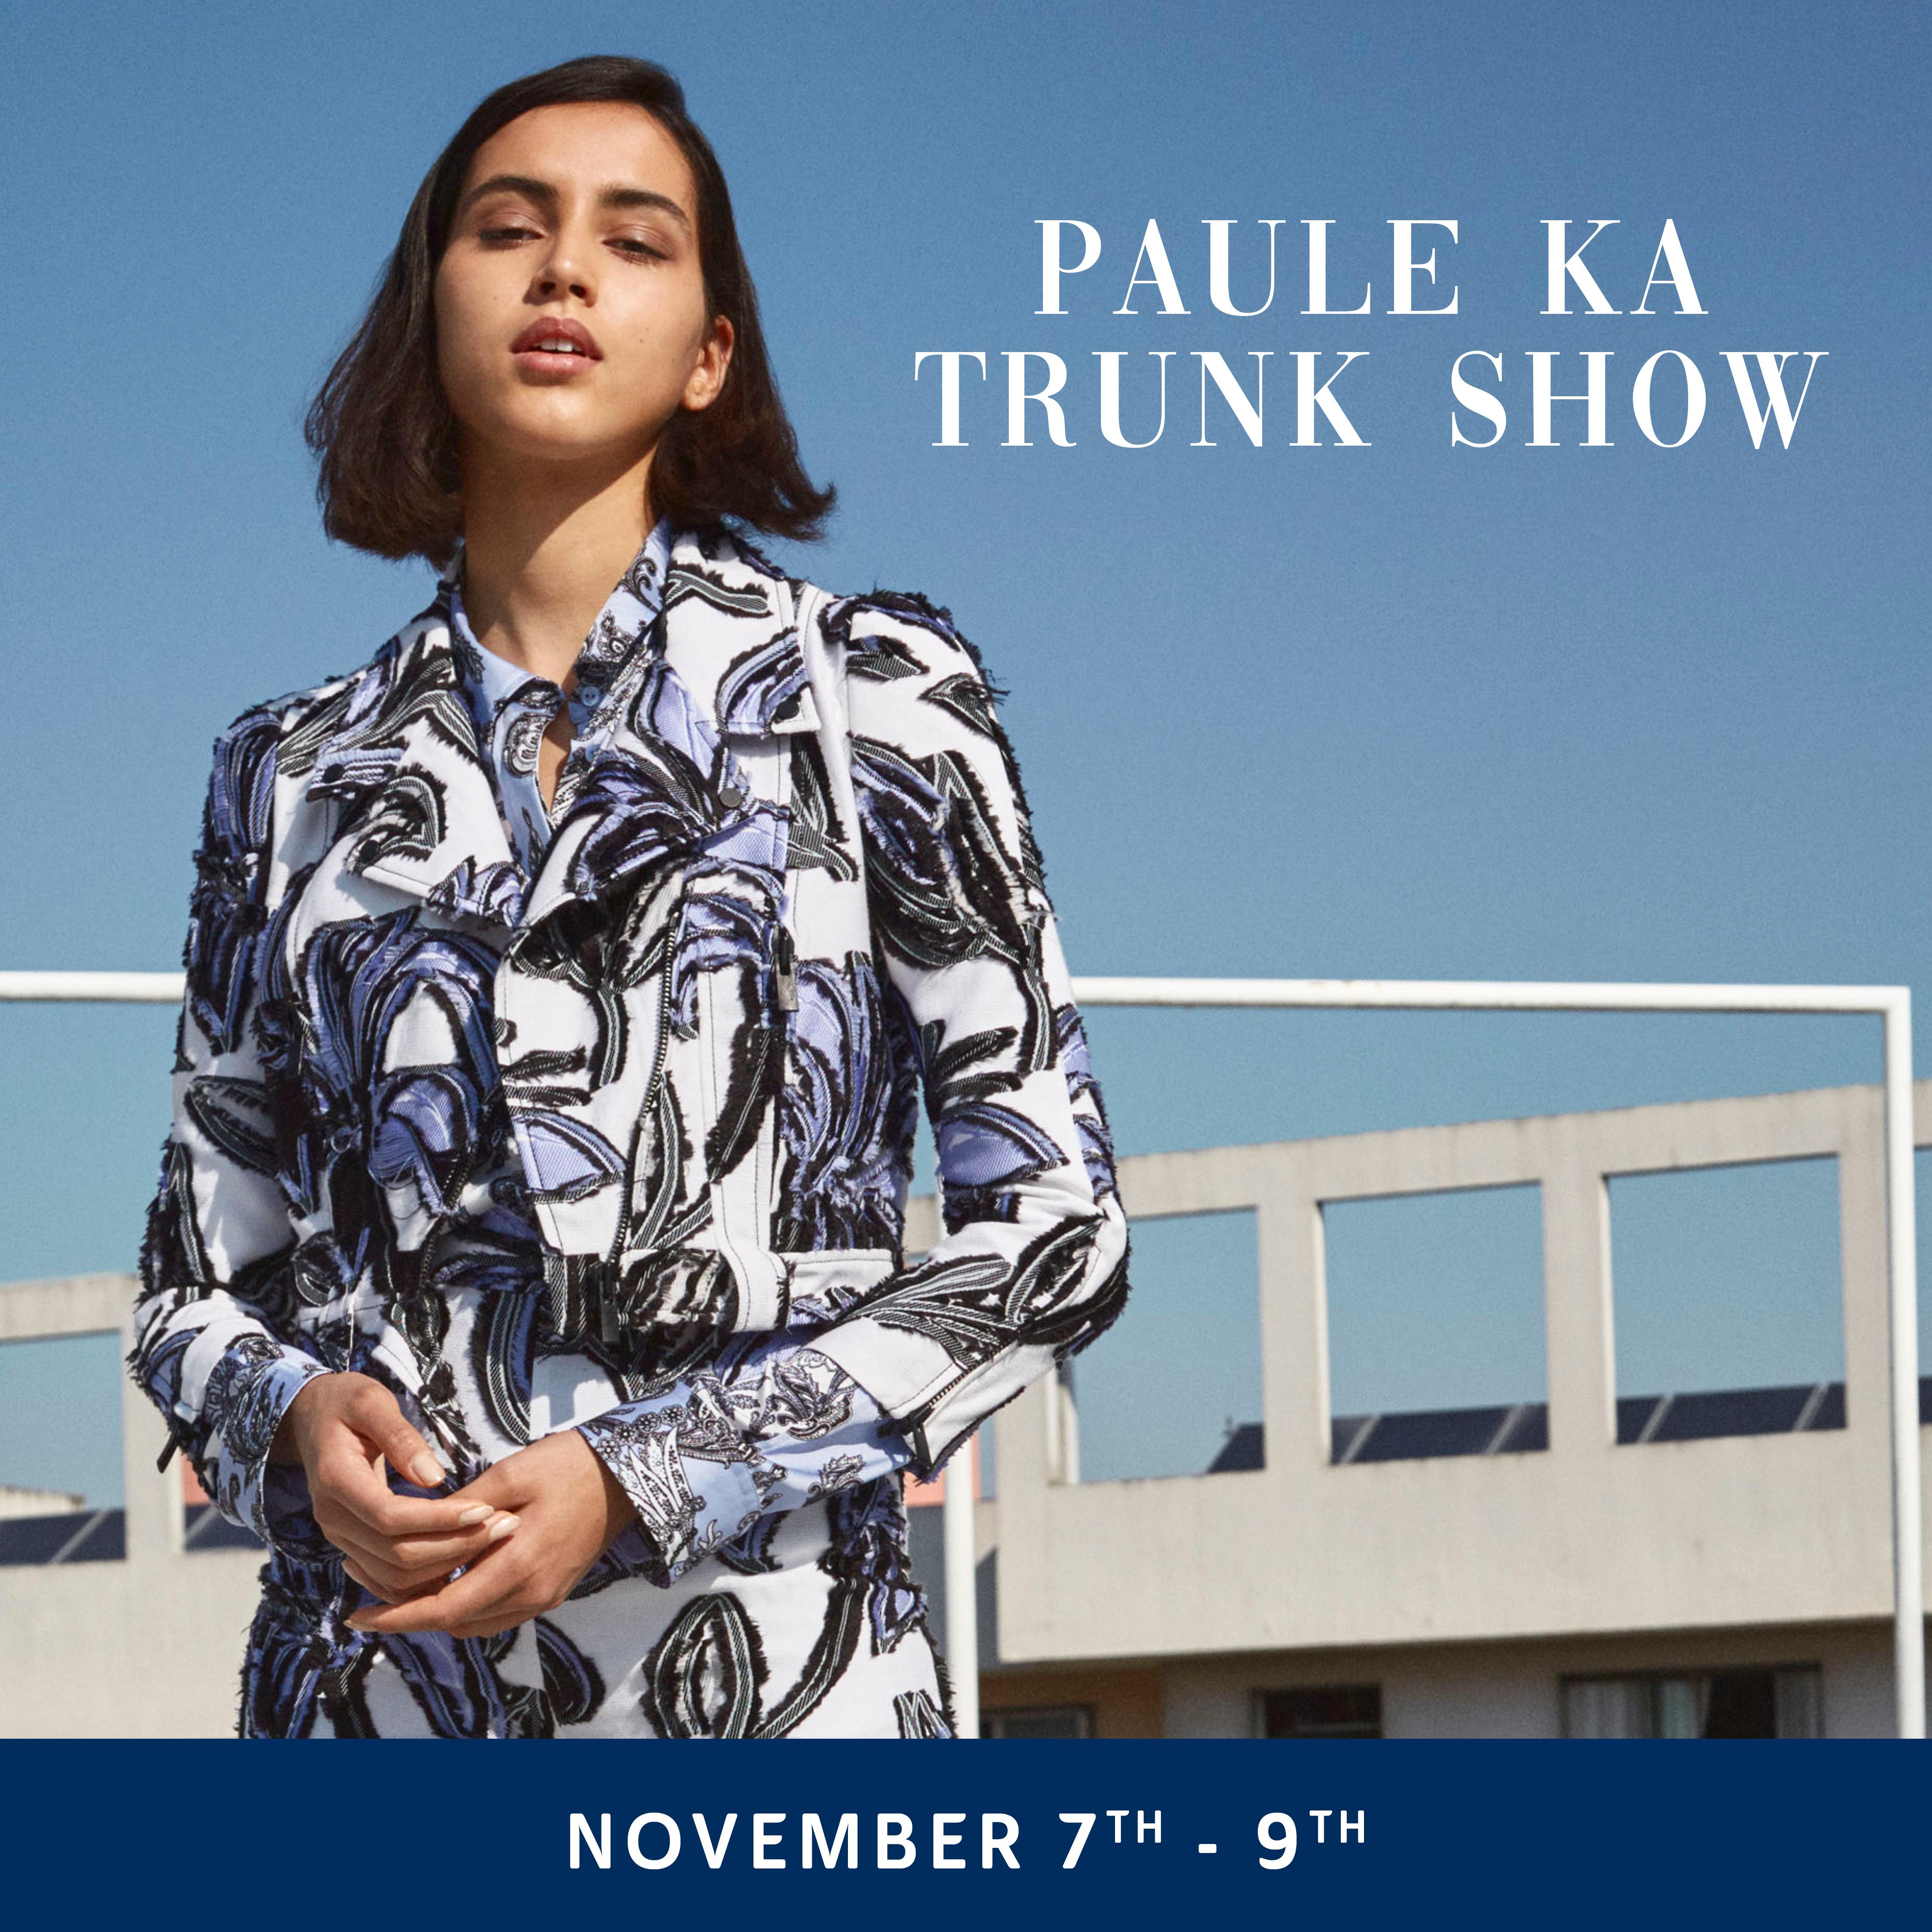 Paule Ka Trunk Show